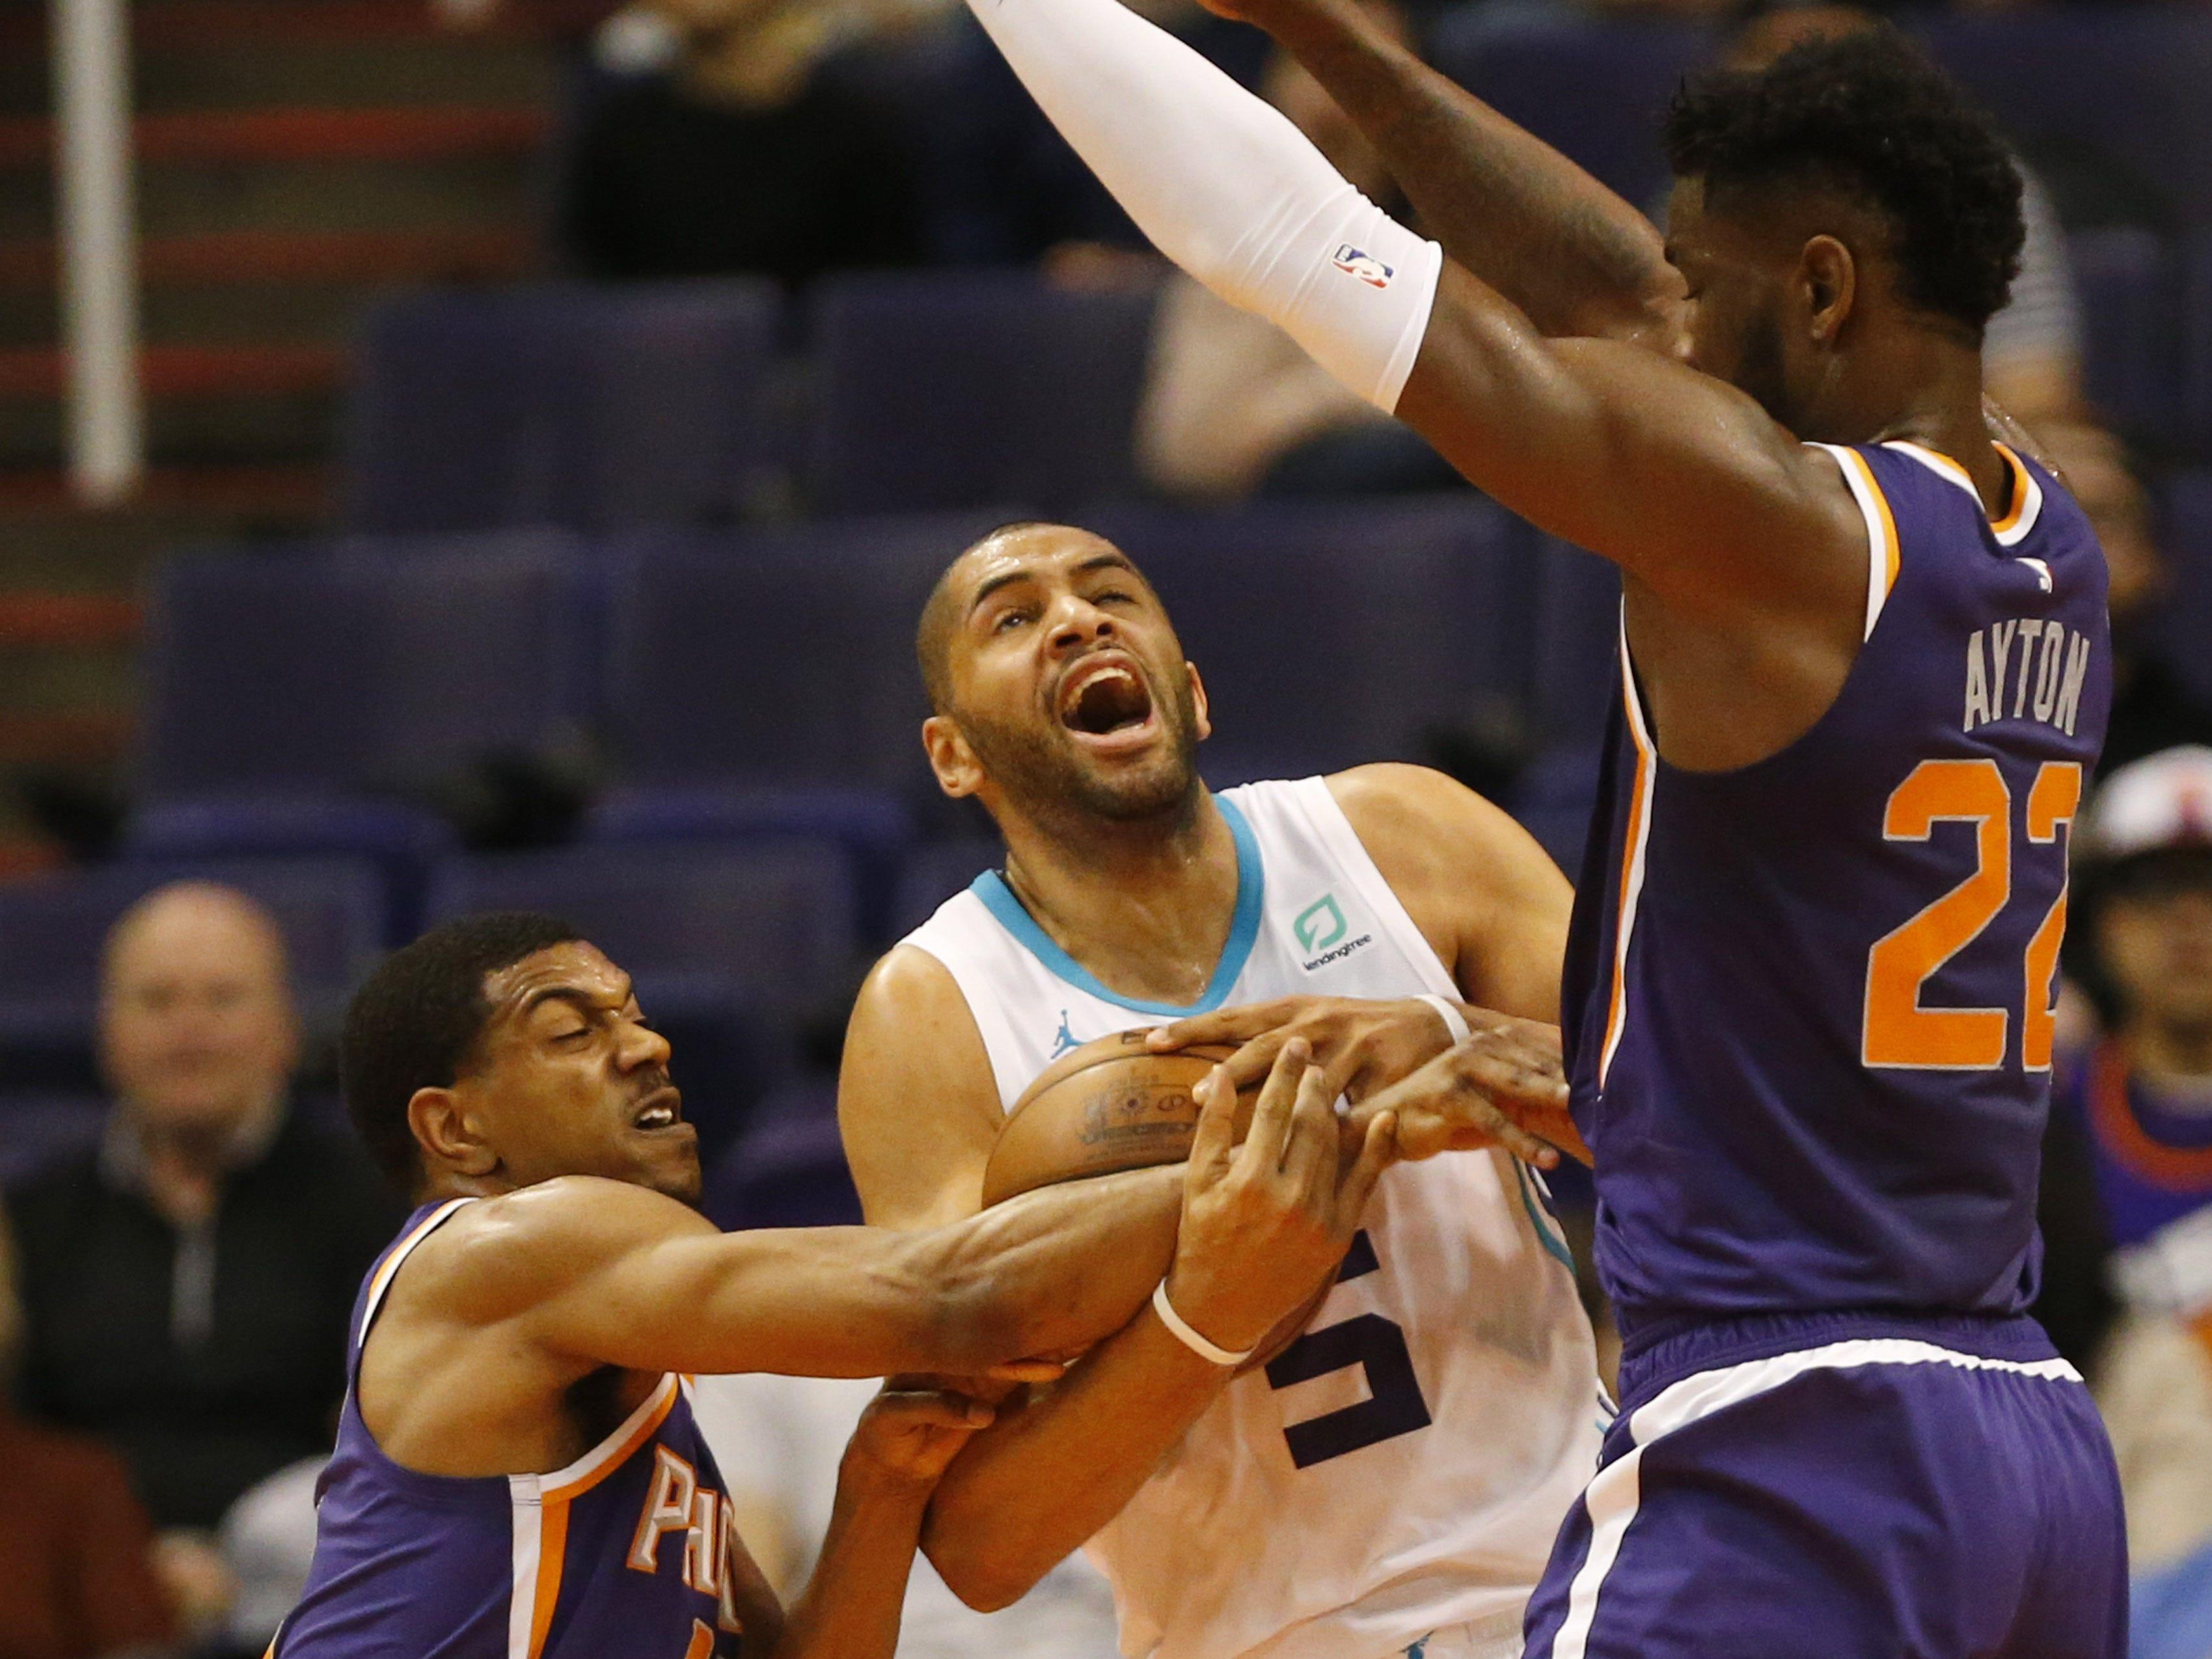 Phoenix Suns guard De'Anthony Melton (14) fouls Charlotte Hornets guard/forward Nicolas Batum (5) during the first quarter in Phoenix January 6, 2019.